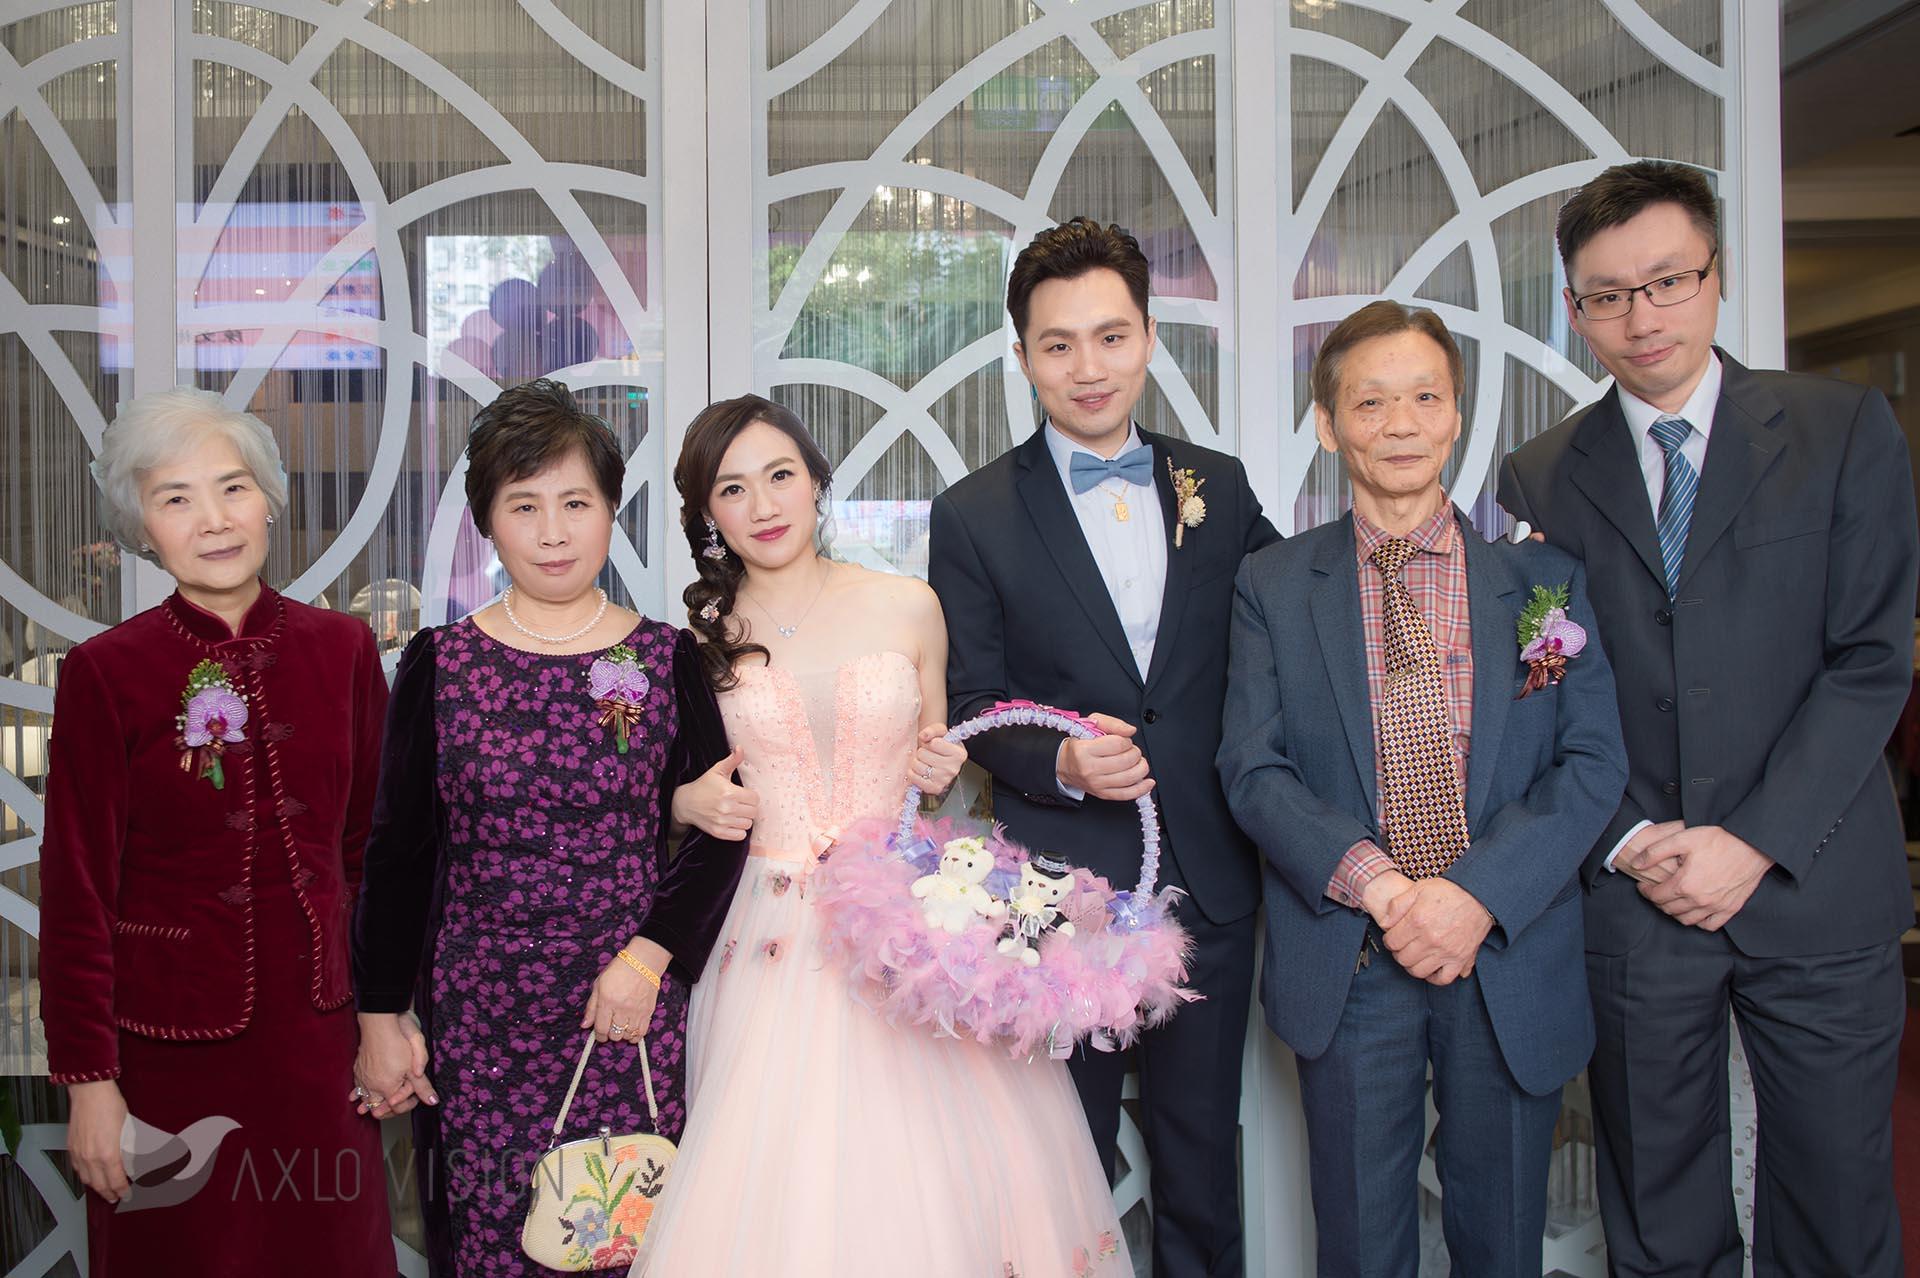 WeddingDay20170401A_244